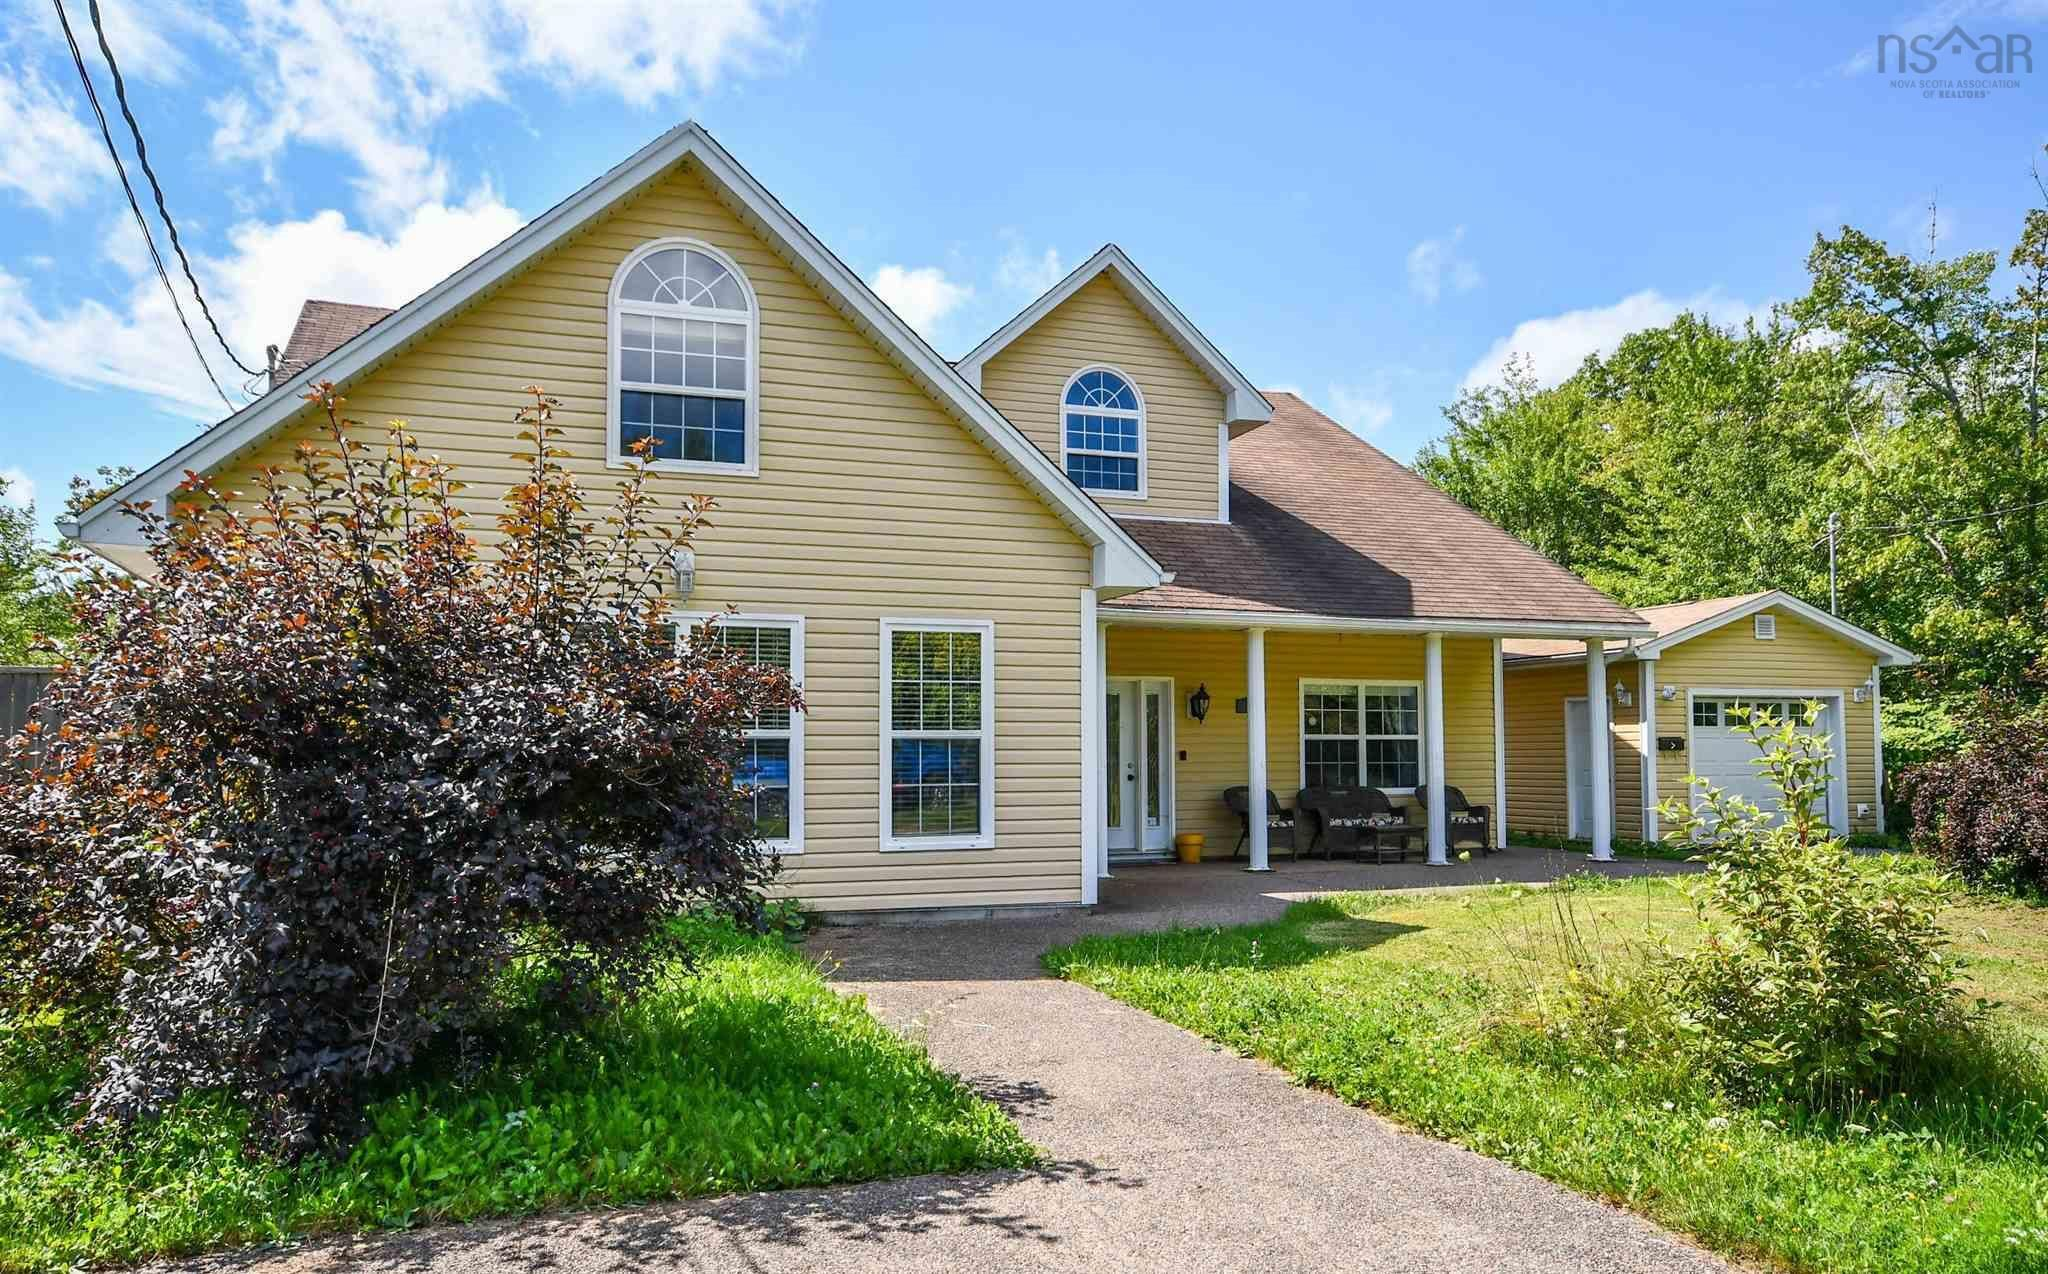 Main Photo: 26 McIntyre Lane in Lower Sackville: 25-Sackville Residential for sale (Halifax-Dartmouth)  : MLS®# 202122605